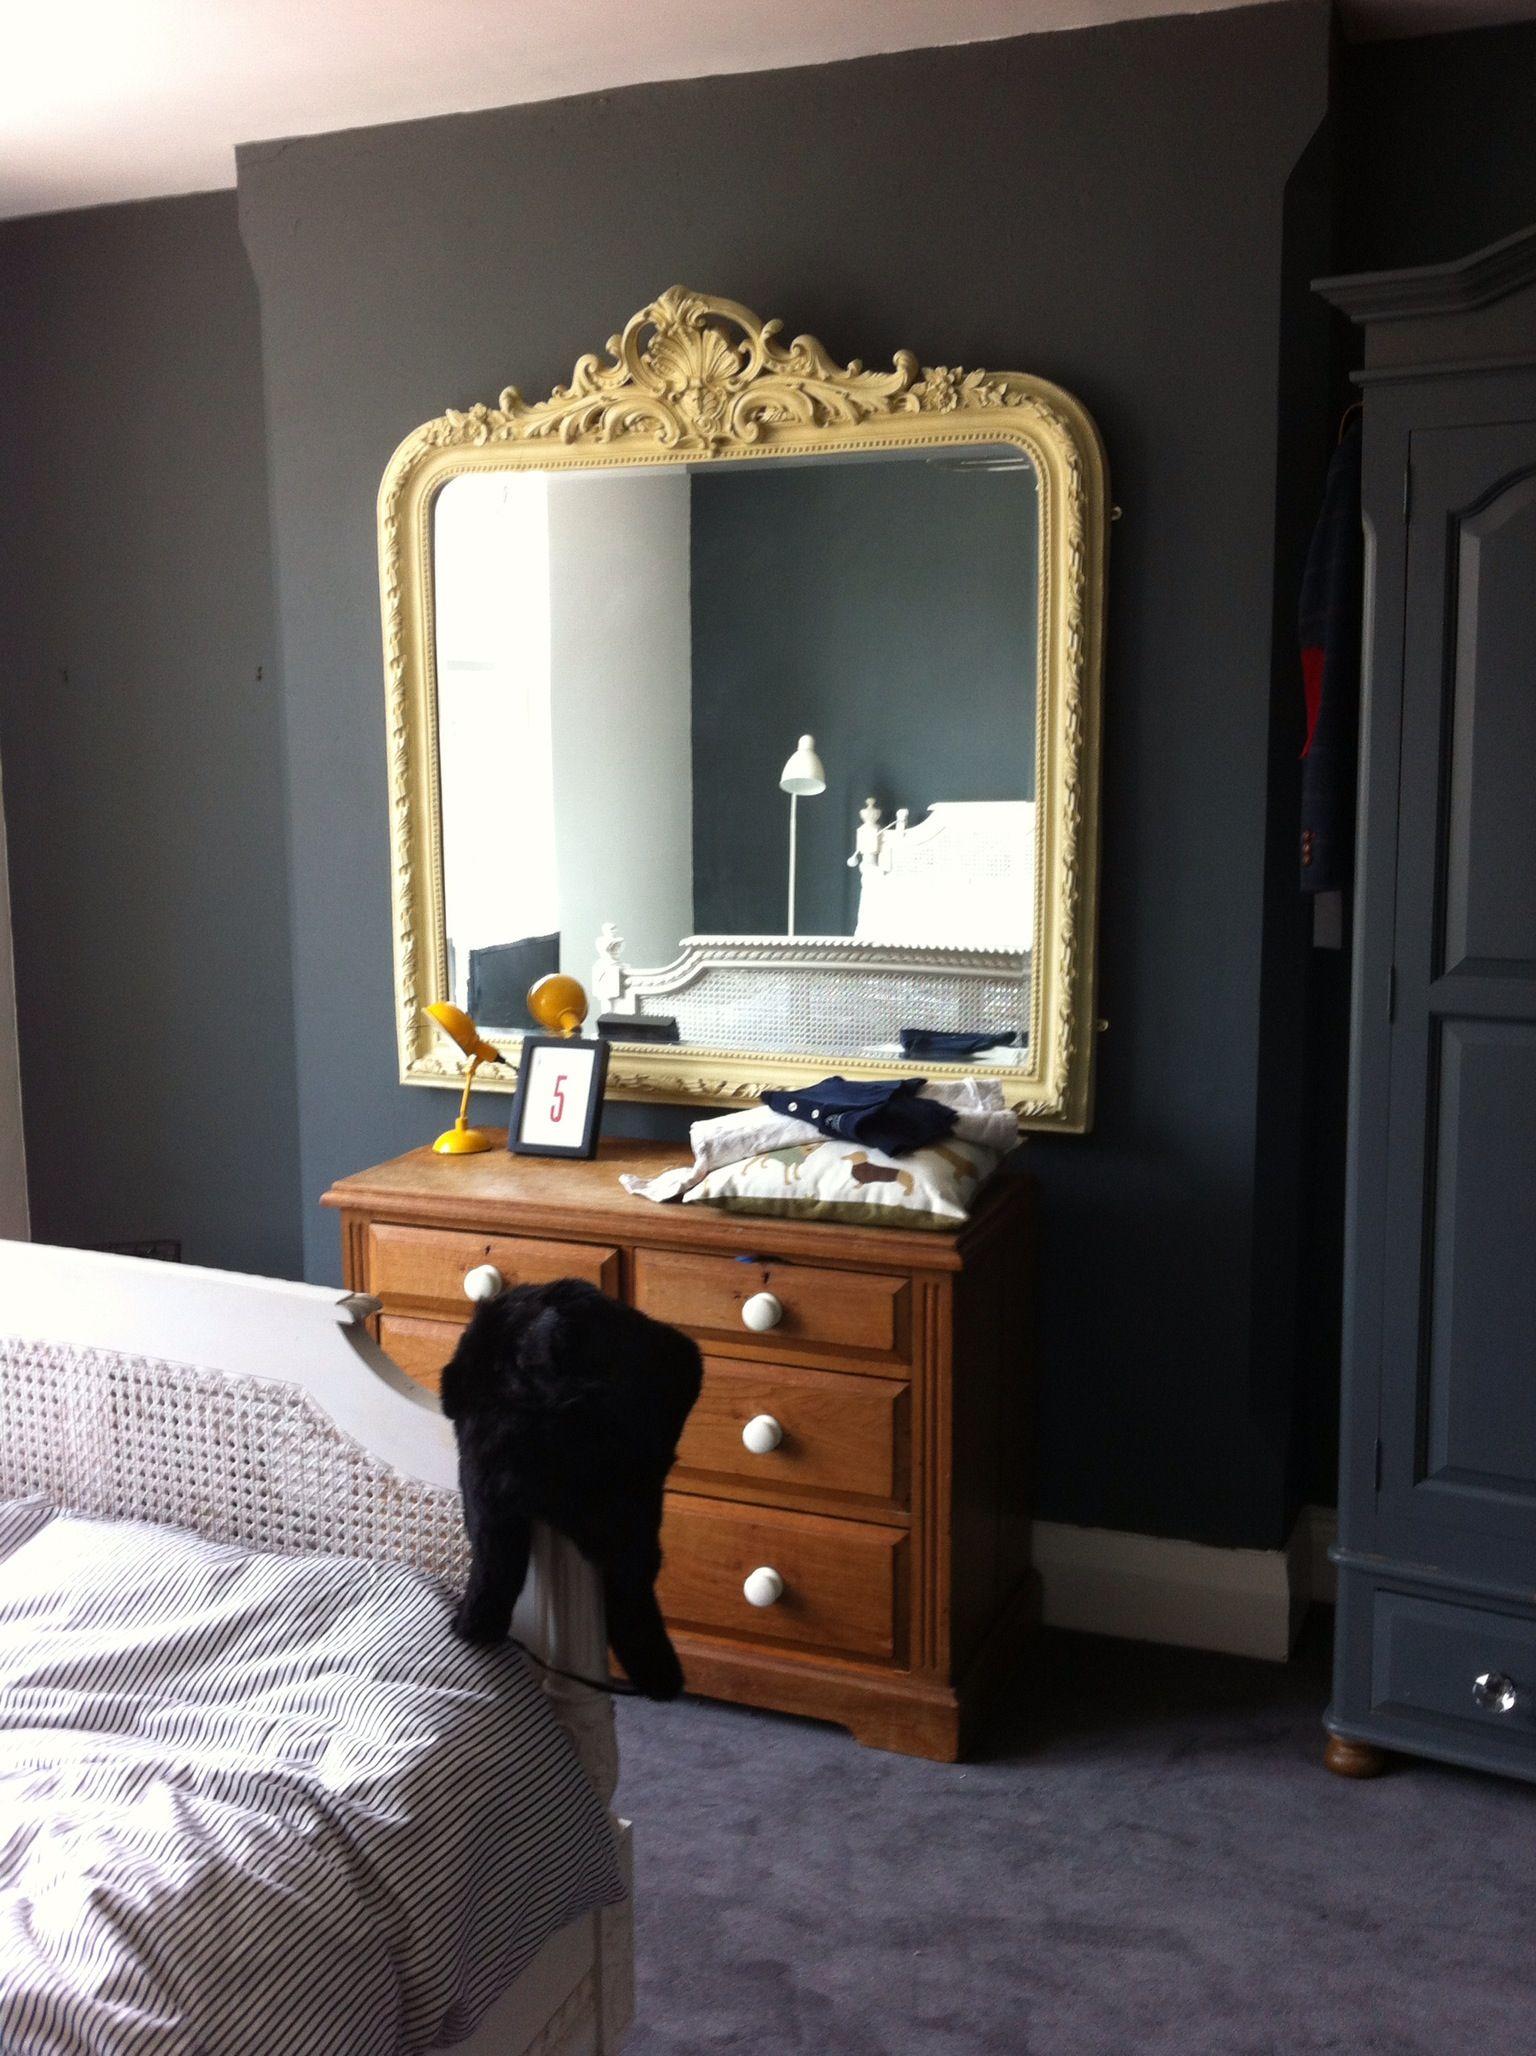 downpipe farrow ball down pipe farrow and ball pinterest bonnes id es idee deco et id e. Black Bedroom Furniture Sets. Home Design Ideas